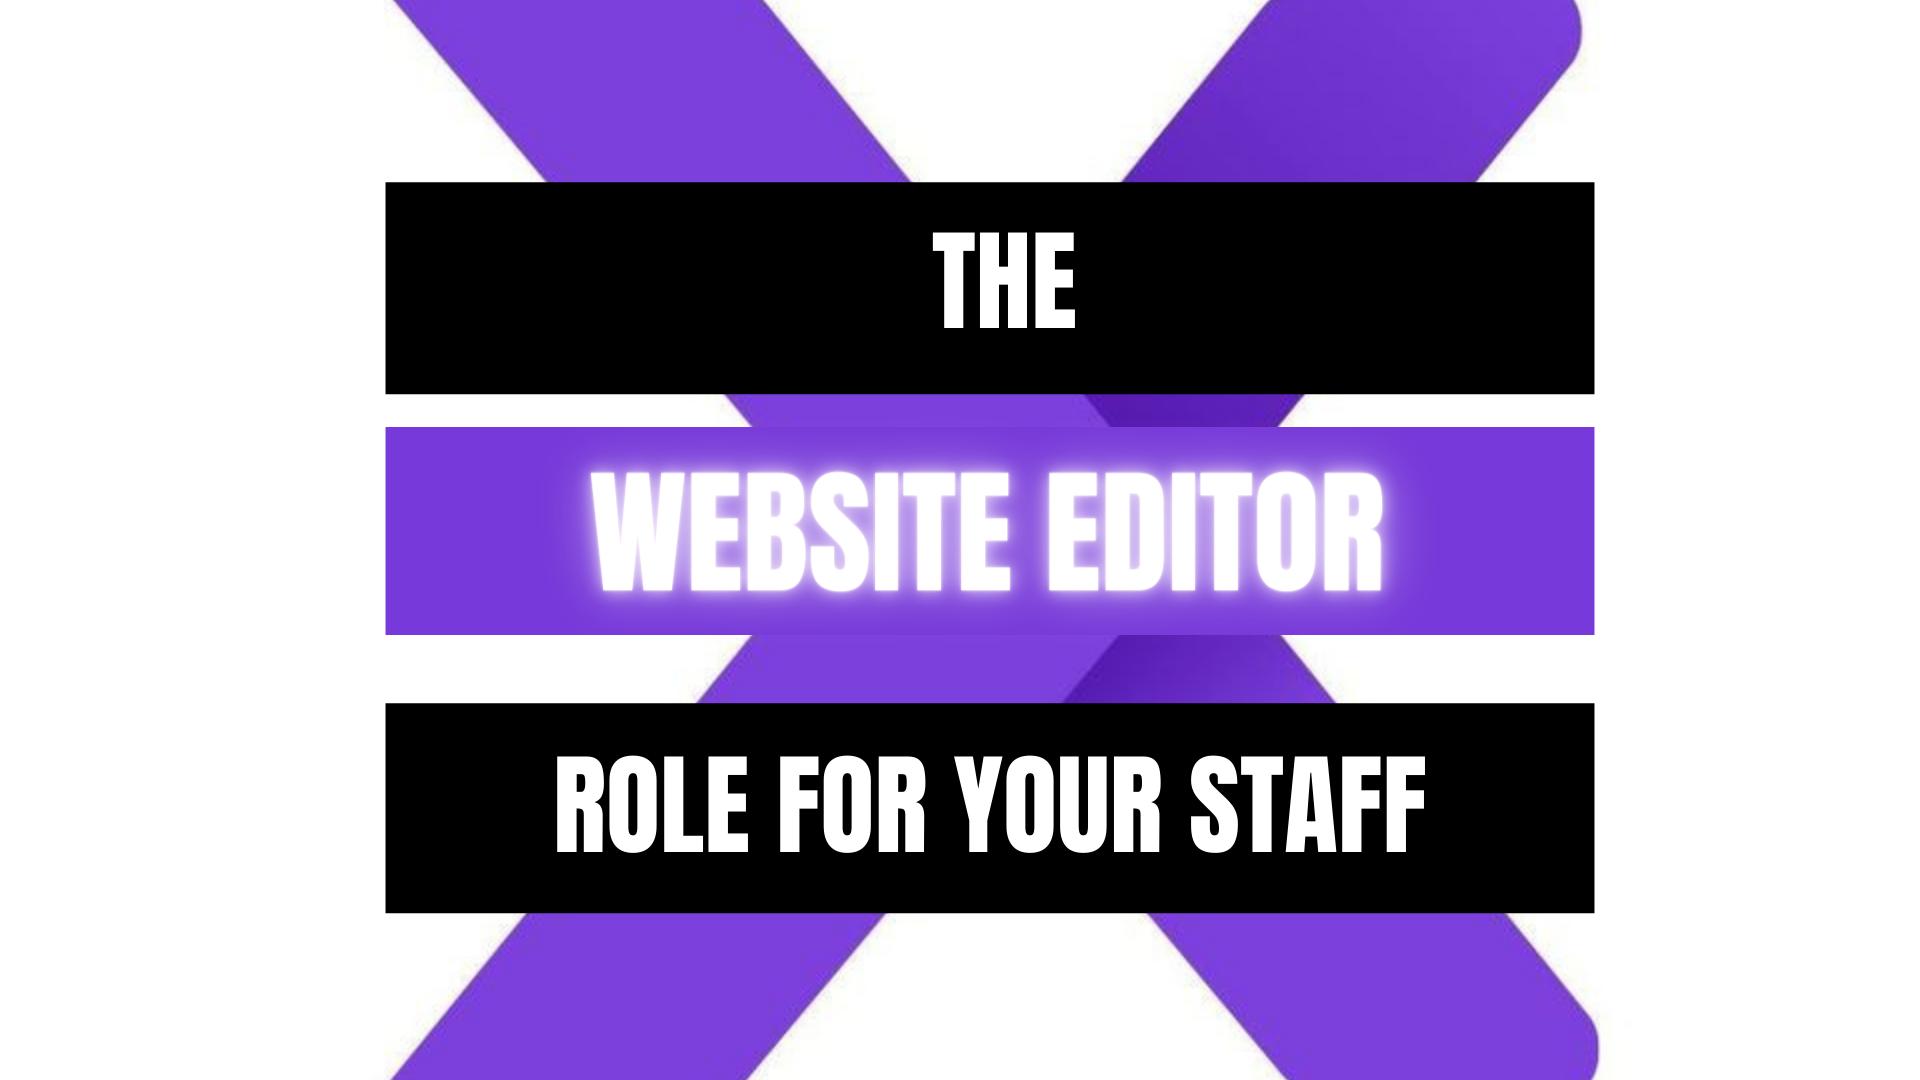 Peekaboox - Website Editor Role